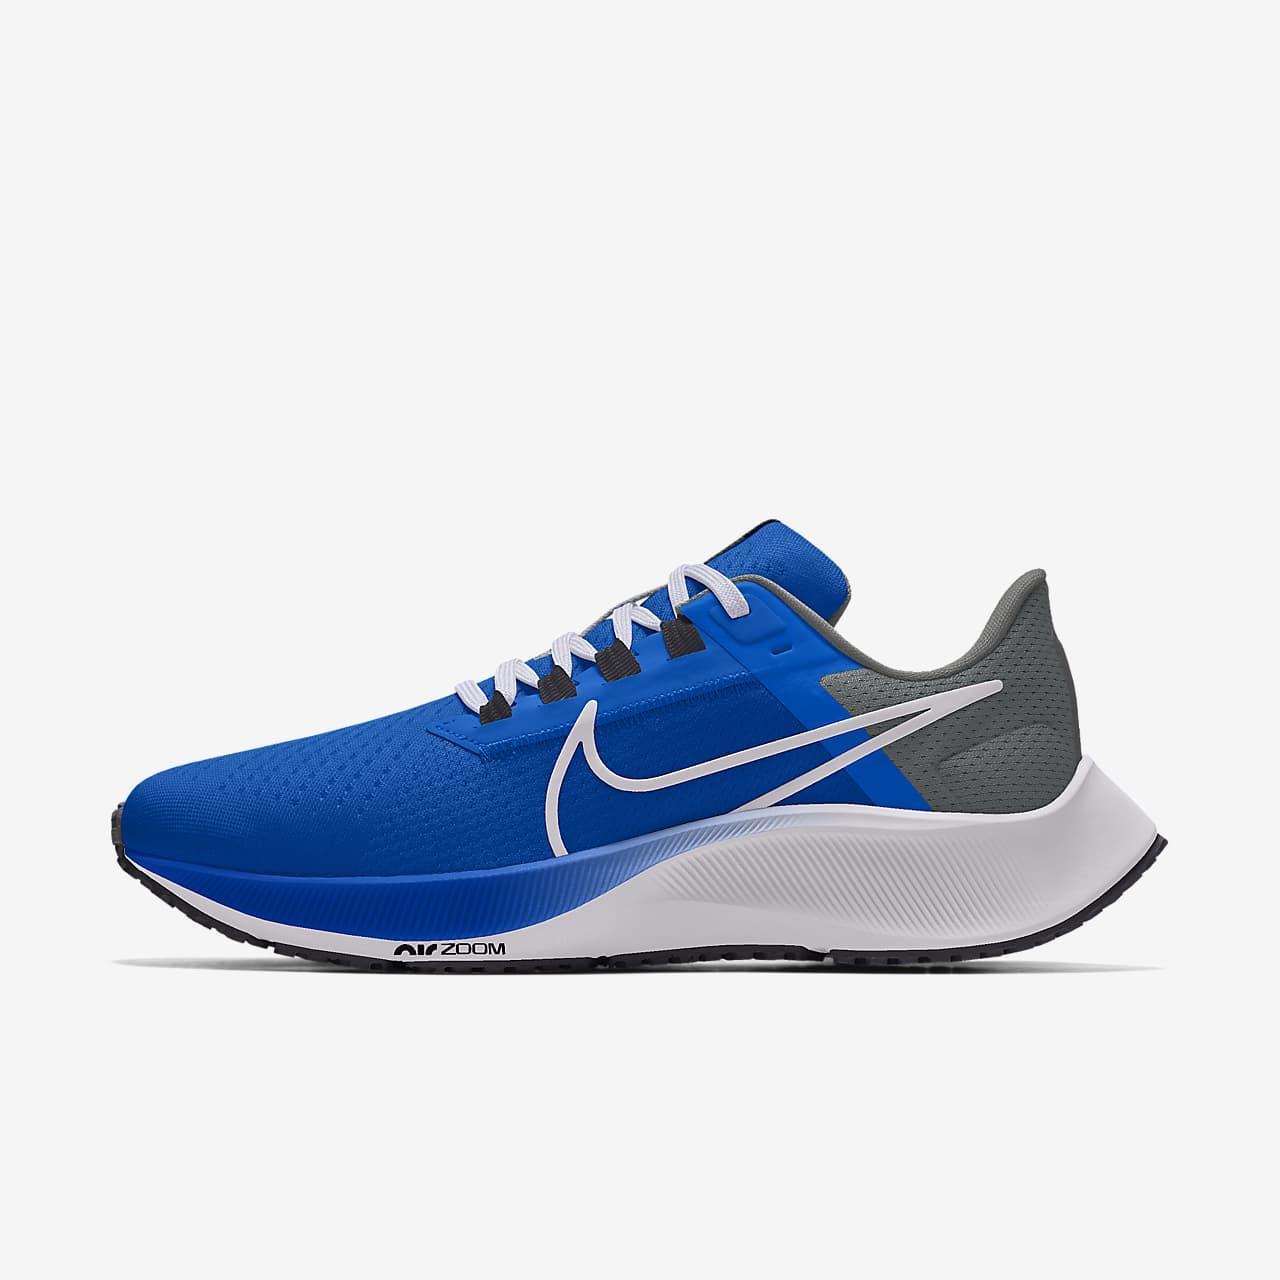 Nike Air Zoom Pegasus 38 By You 专属定制男子跑步鞋